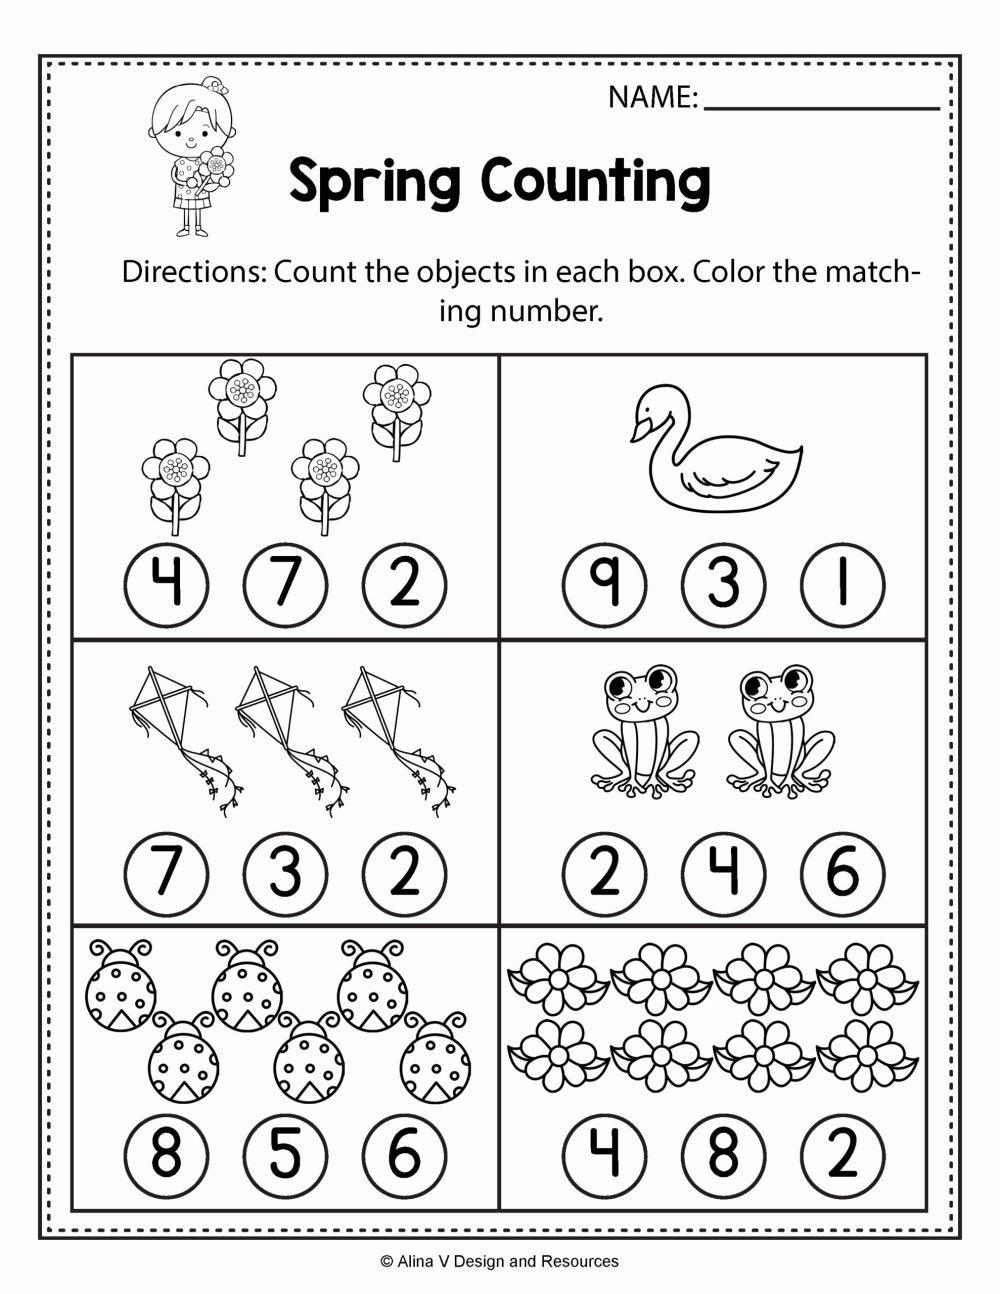 medium resolution of Spatial Concepts Worksheets for Preschoolers Fresh Directions Worksheet  Preschool Printable Worksheets and – Printable Worksheets for Kids